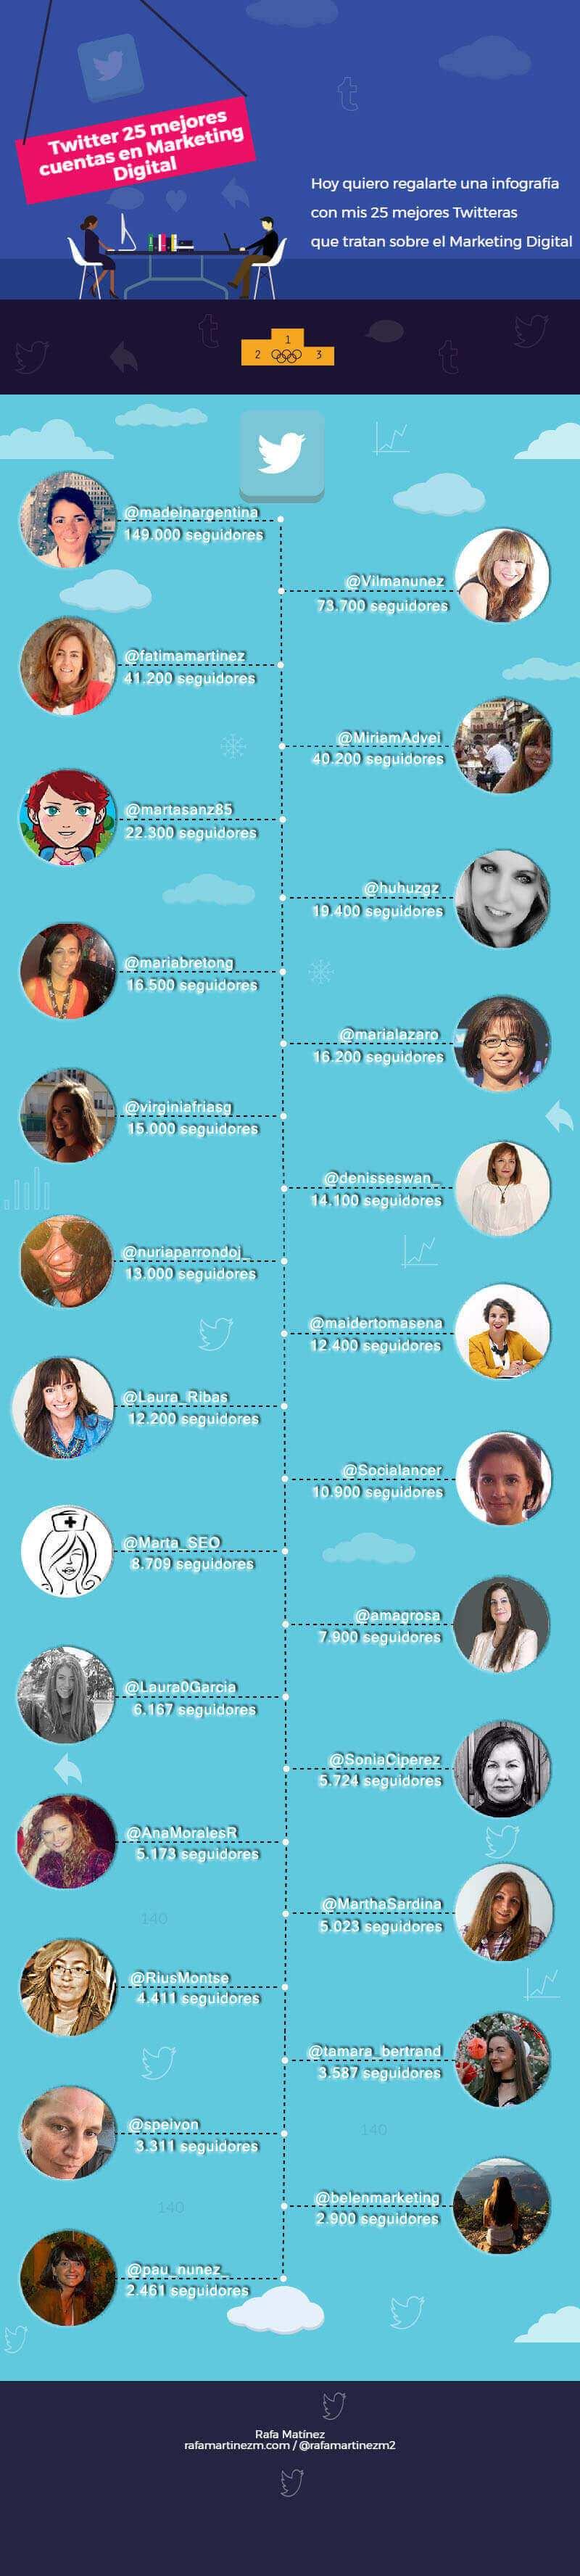 25 mejores twitteras de Marketing Digital